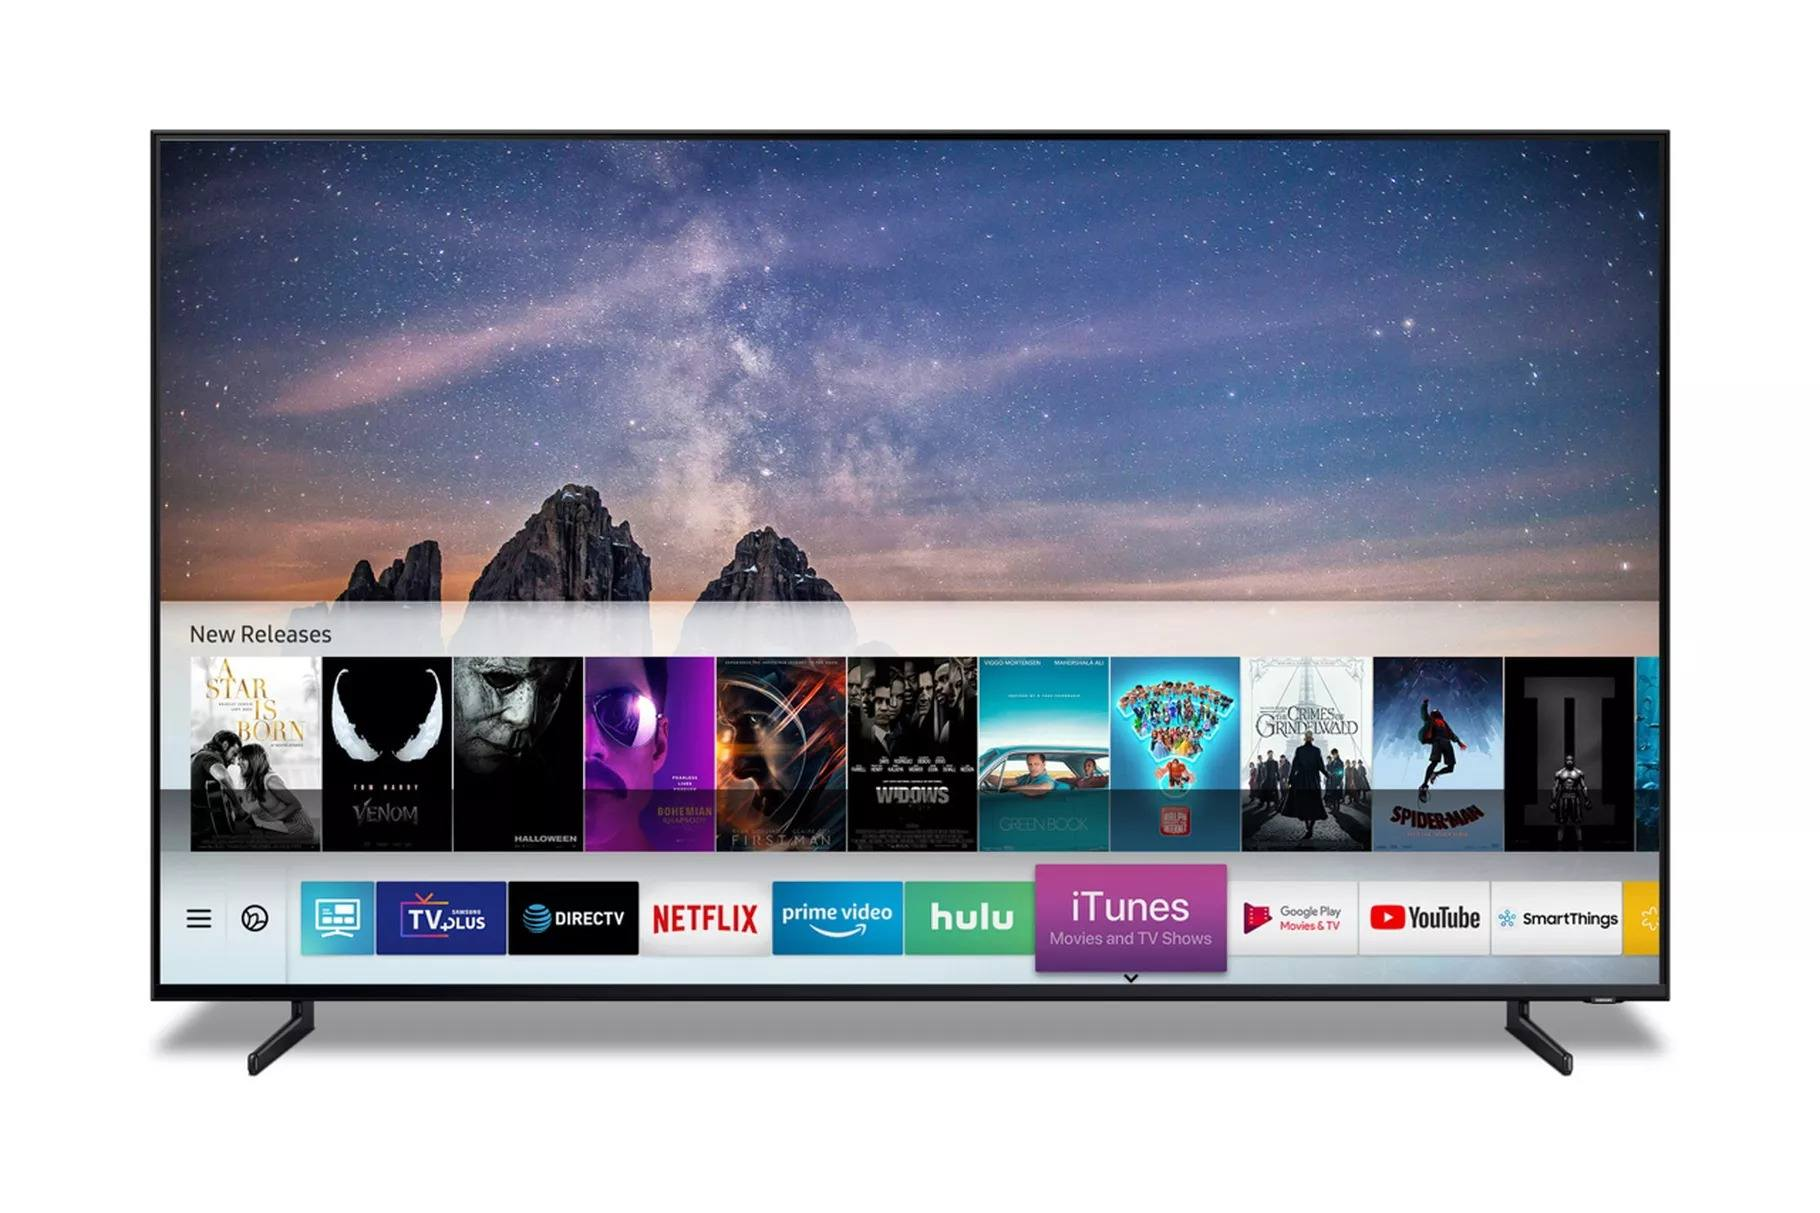 itunes samsung smart tv